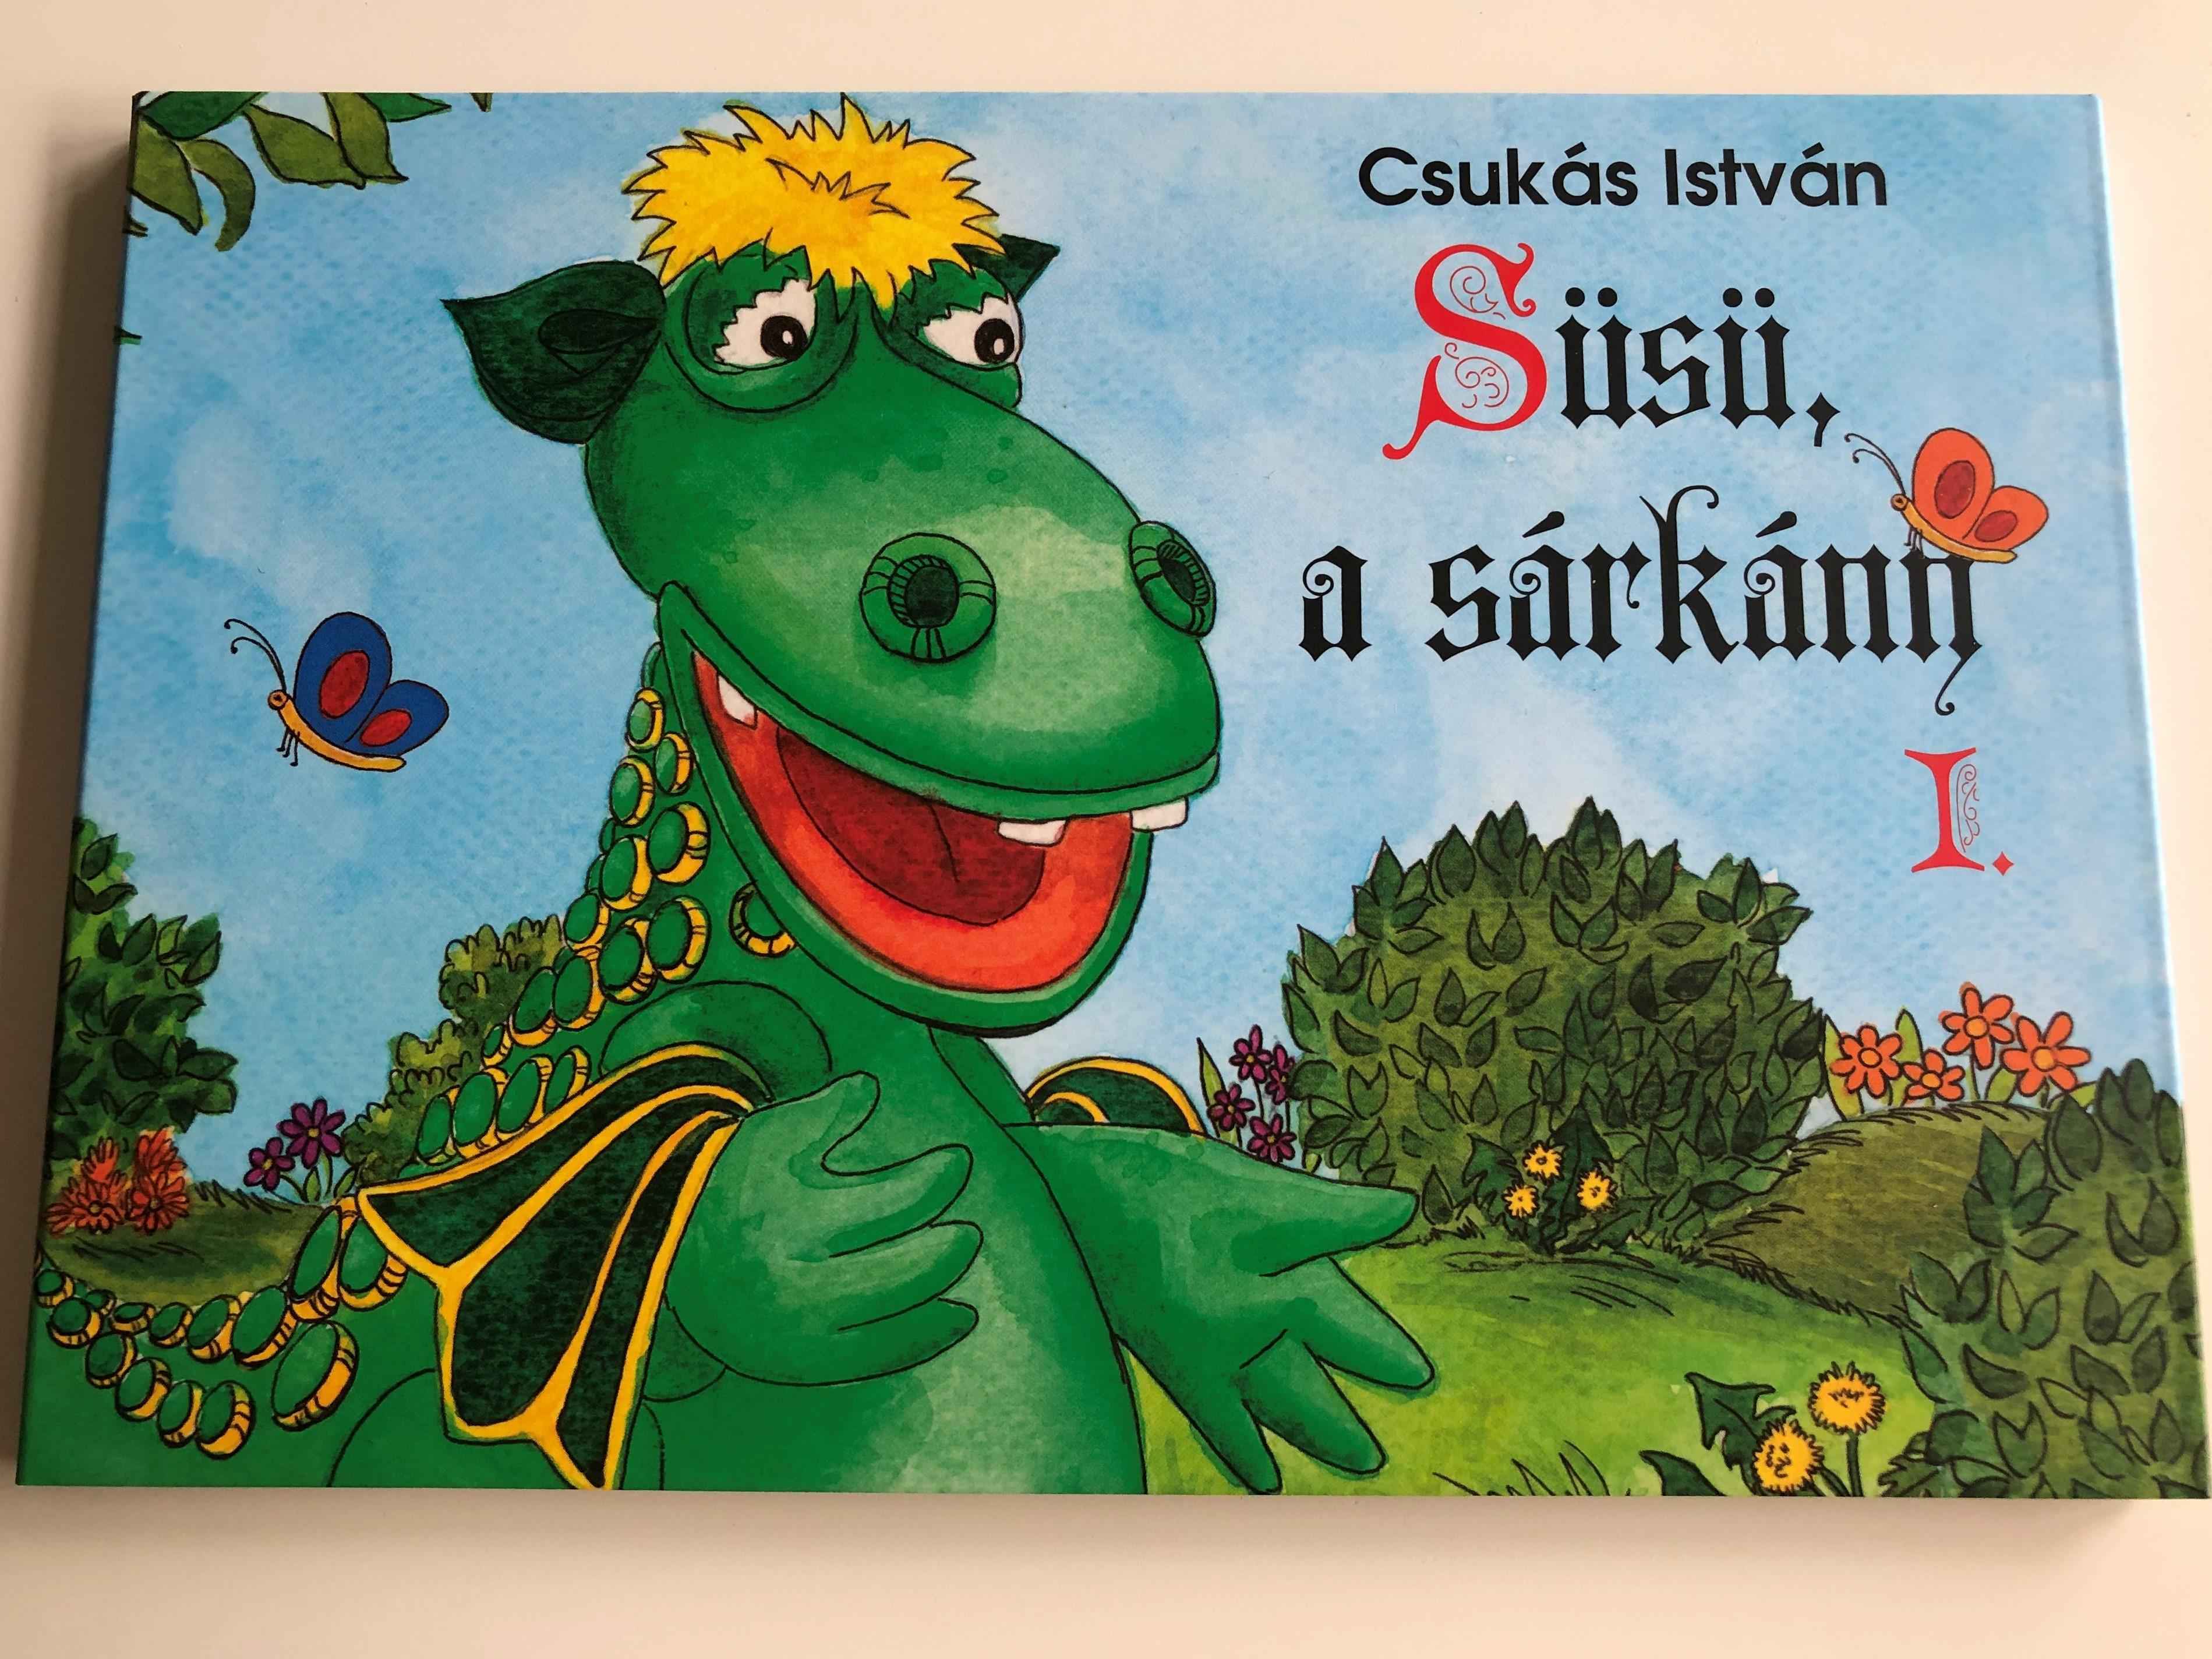 csuk-s-istv-n-s-s-a-s-rk-ny-i.-sz-nes-lapoz-2-ves-kort-l-s-s-the-dragon-hungarian-children-s-color-board-book-2017-k-nyvmolyk-pz-kiad-1-.jpg